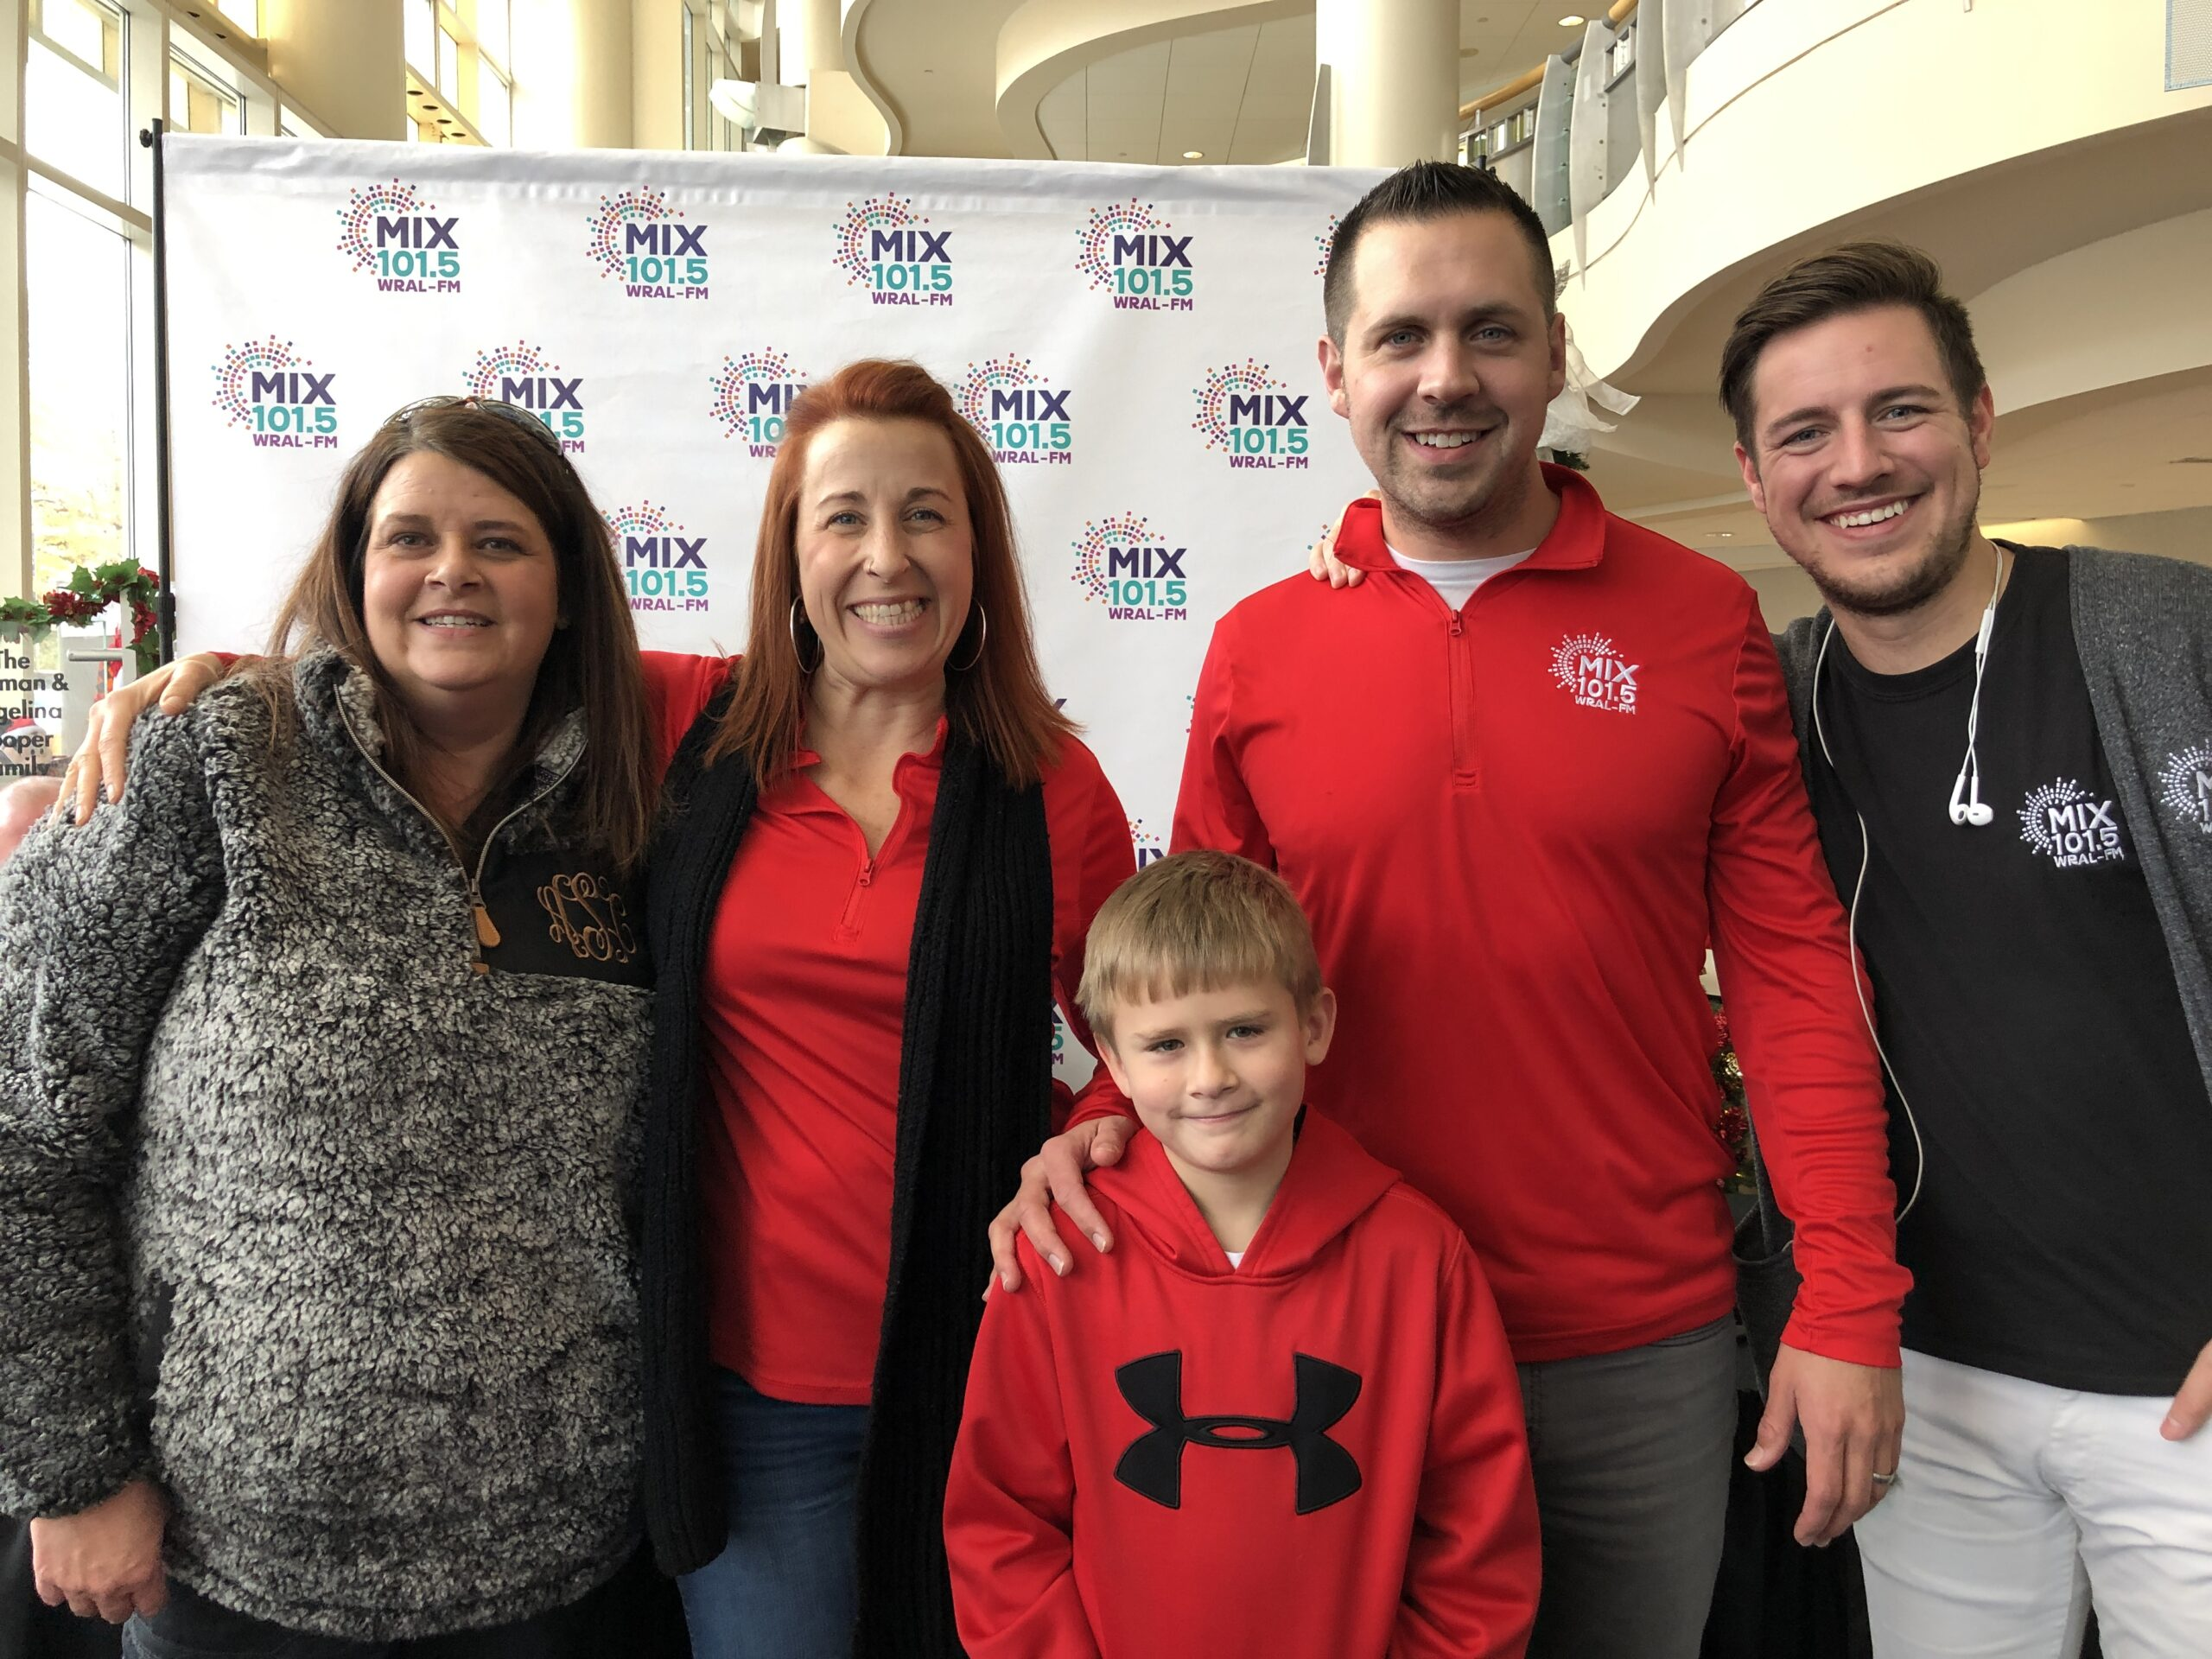 Radiothon for Duke Children's Hospital - MIX 101 5